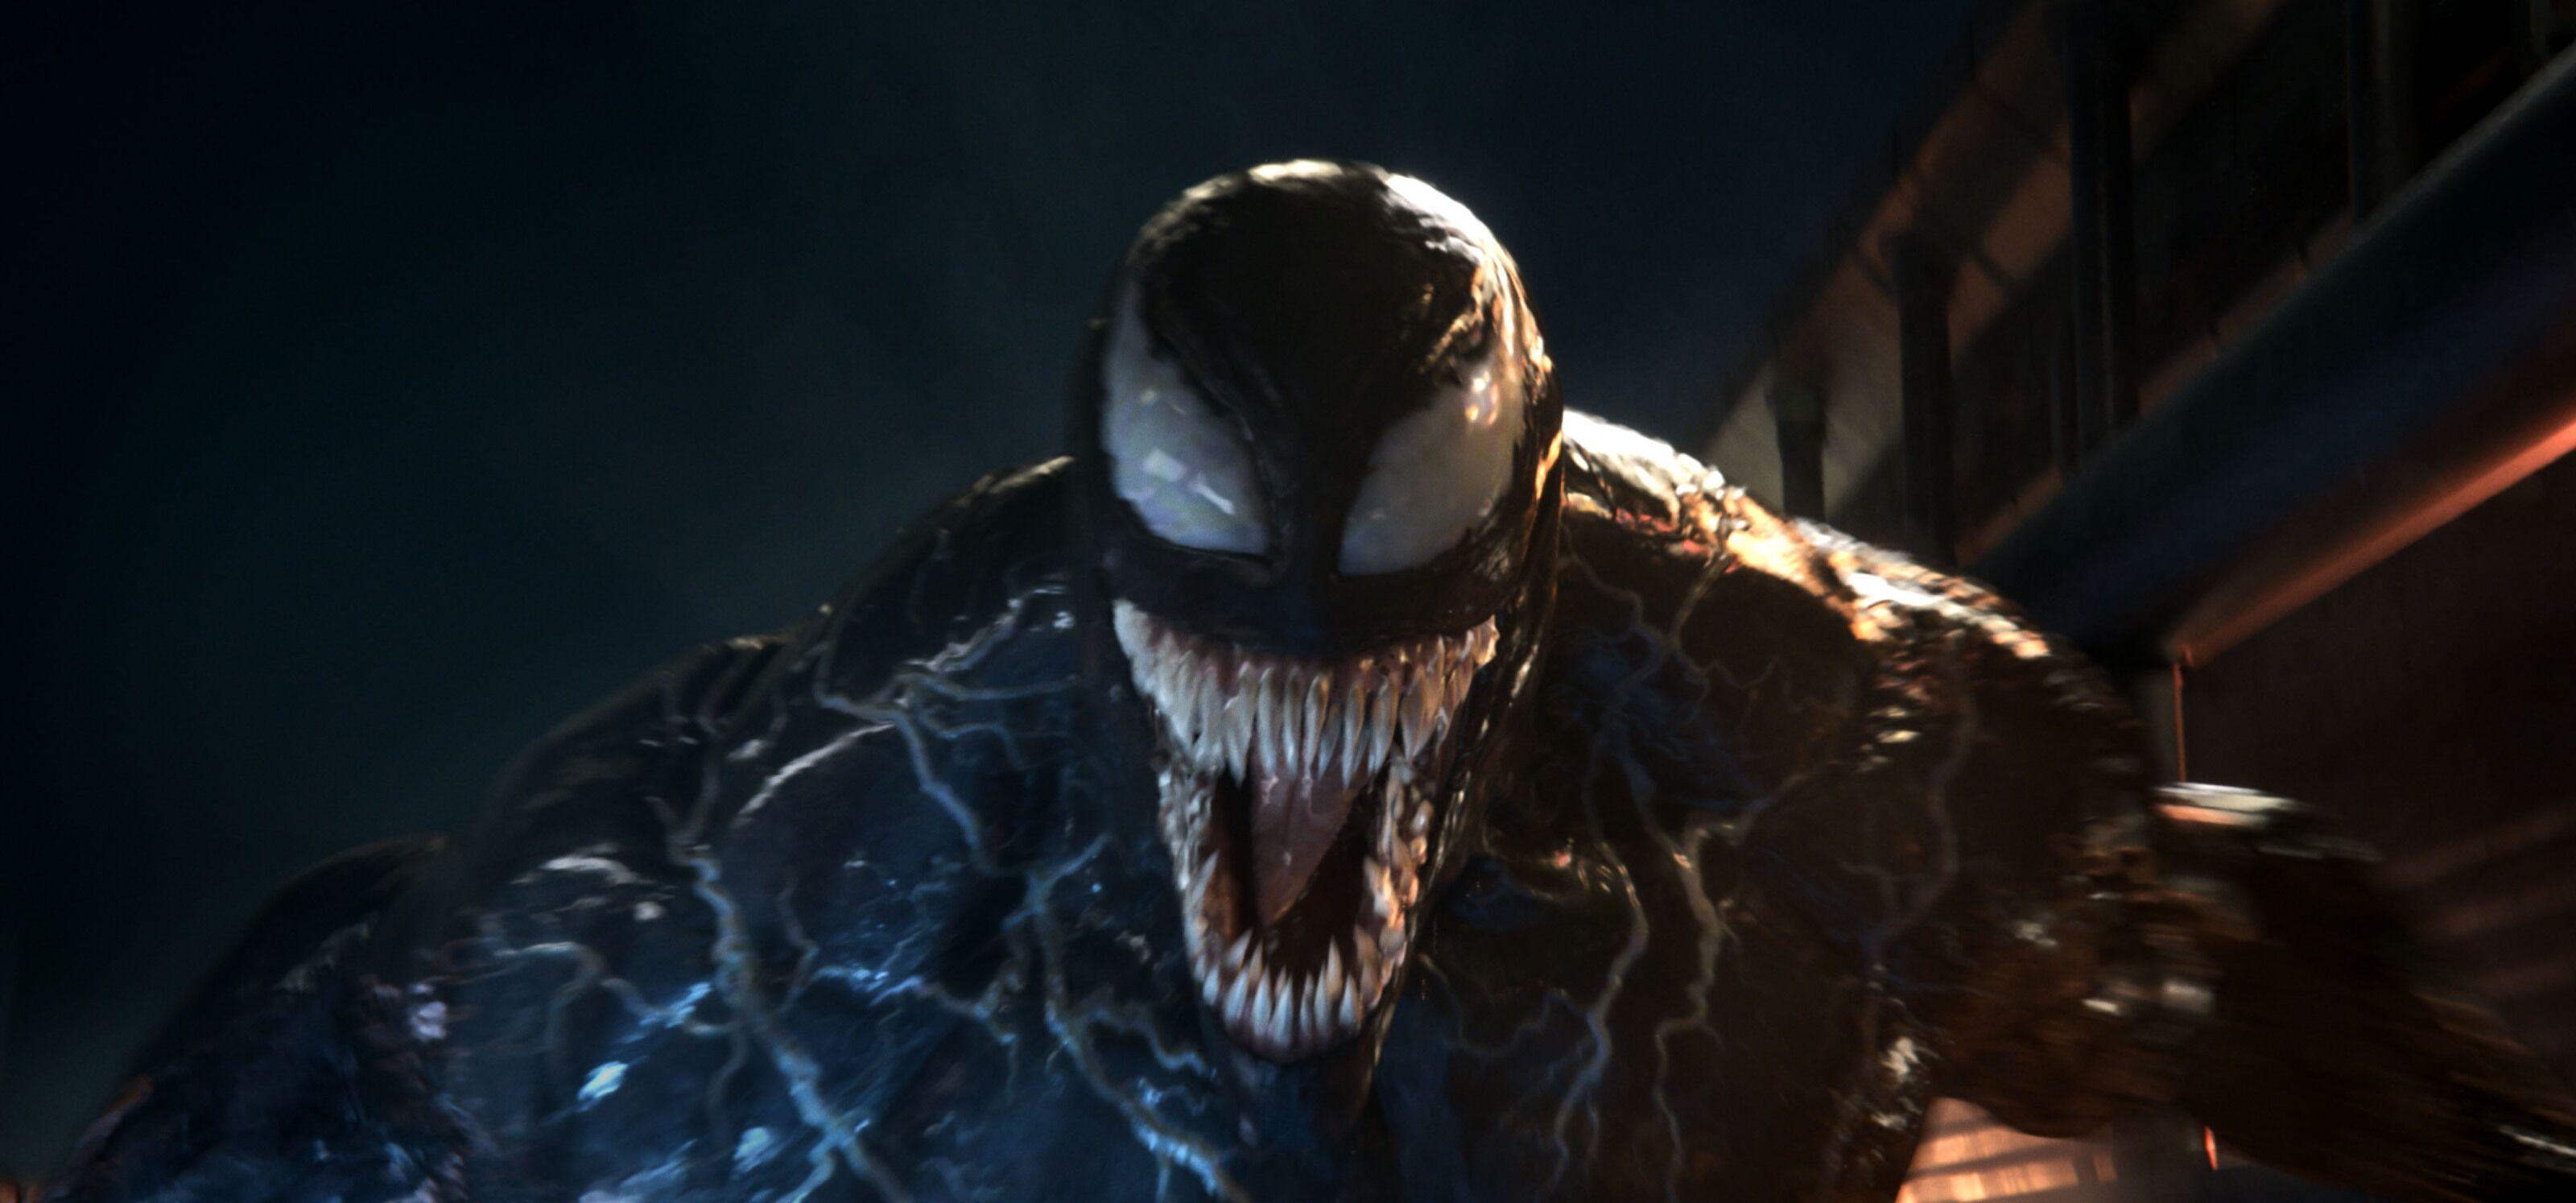 Set photos from Venom 2 show Cletus Kasady's new look